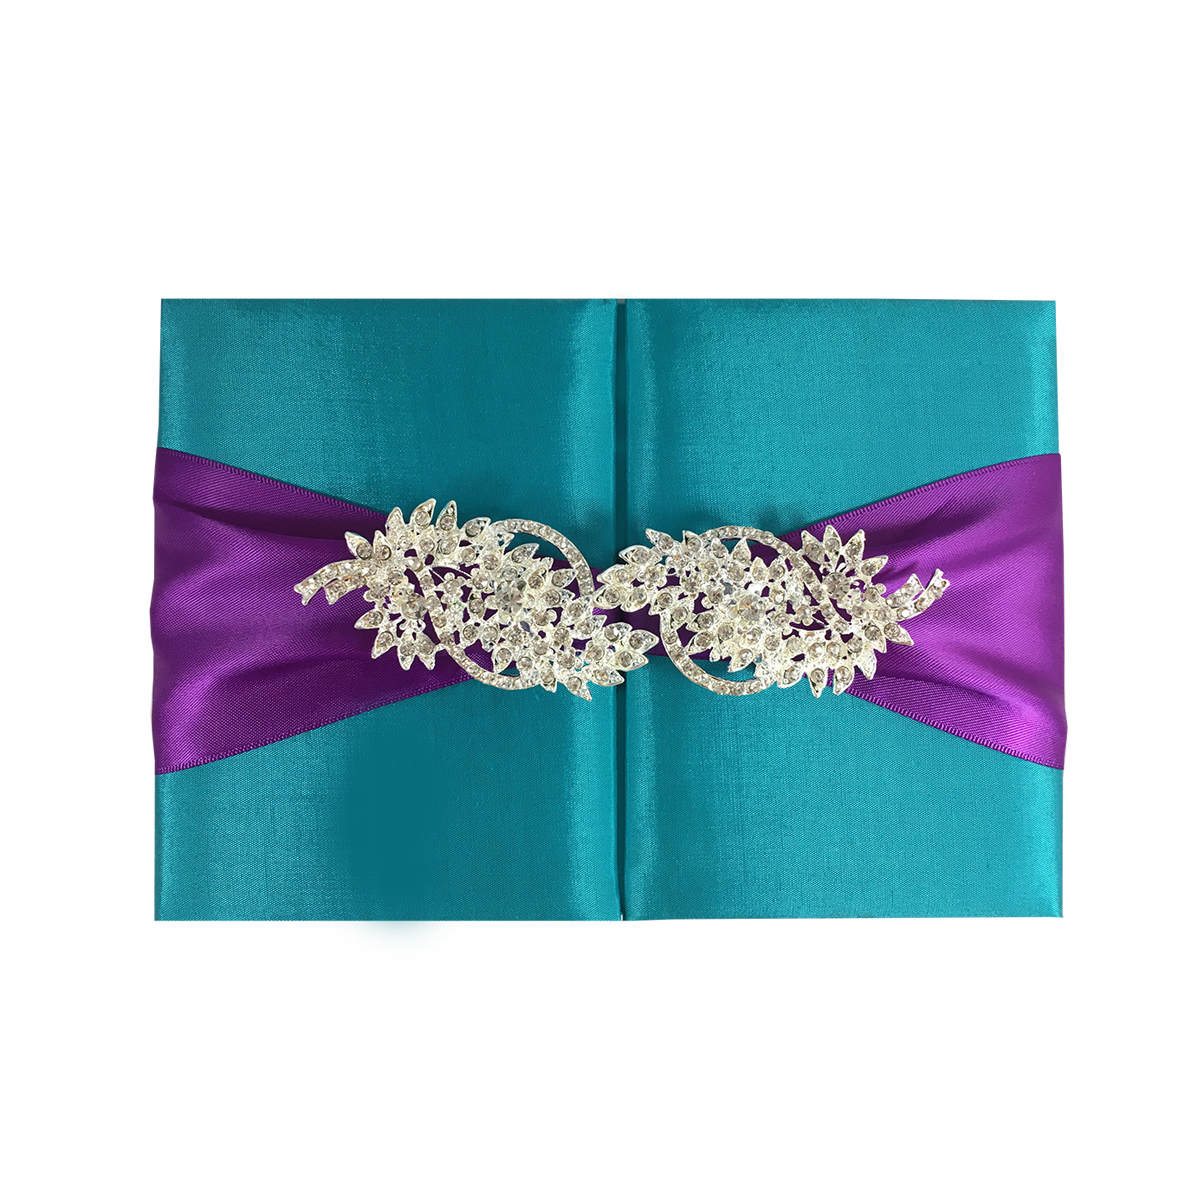 Light Teal Color Silk Wedding Folder Amp Large Brooch Embellishment Luxury Wedding Invitations